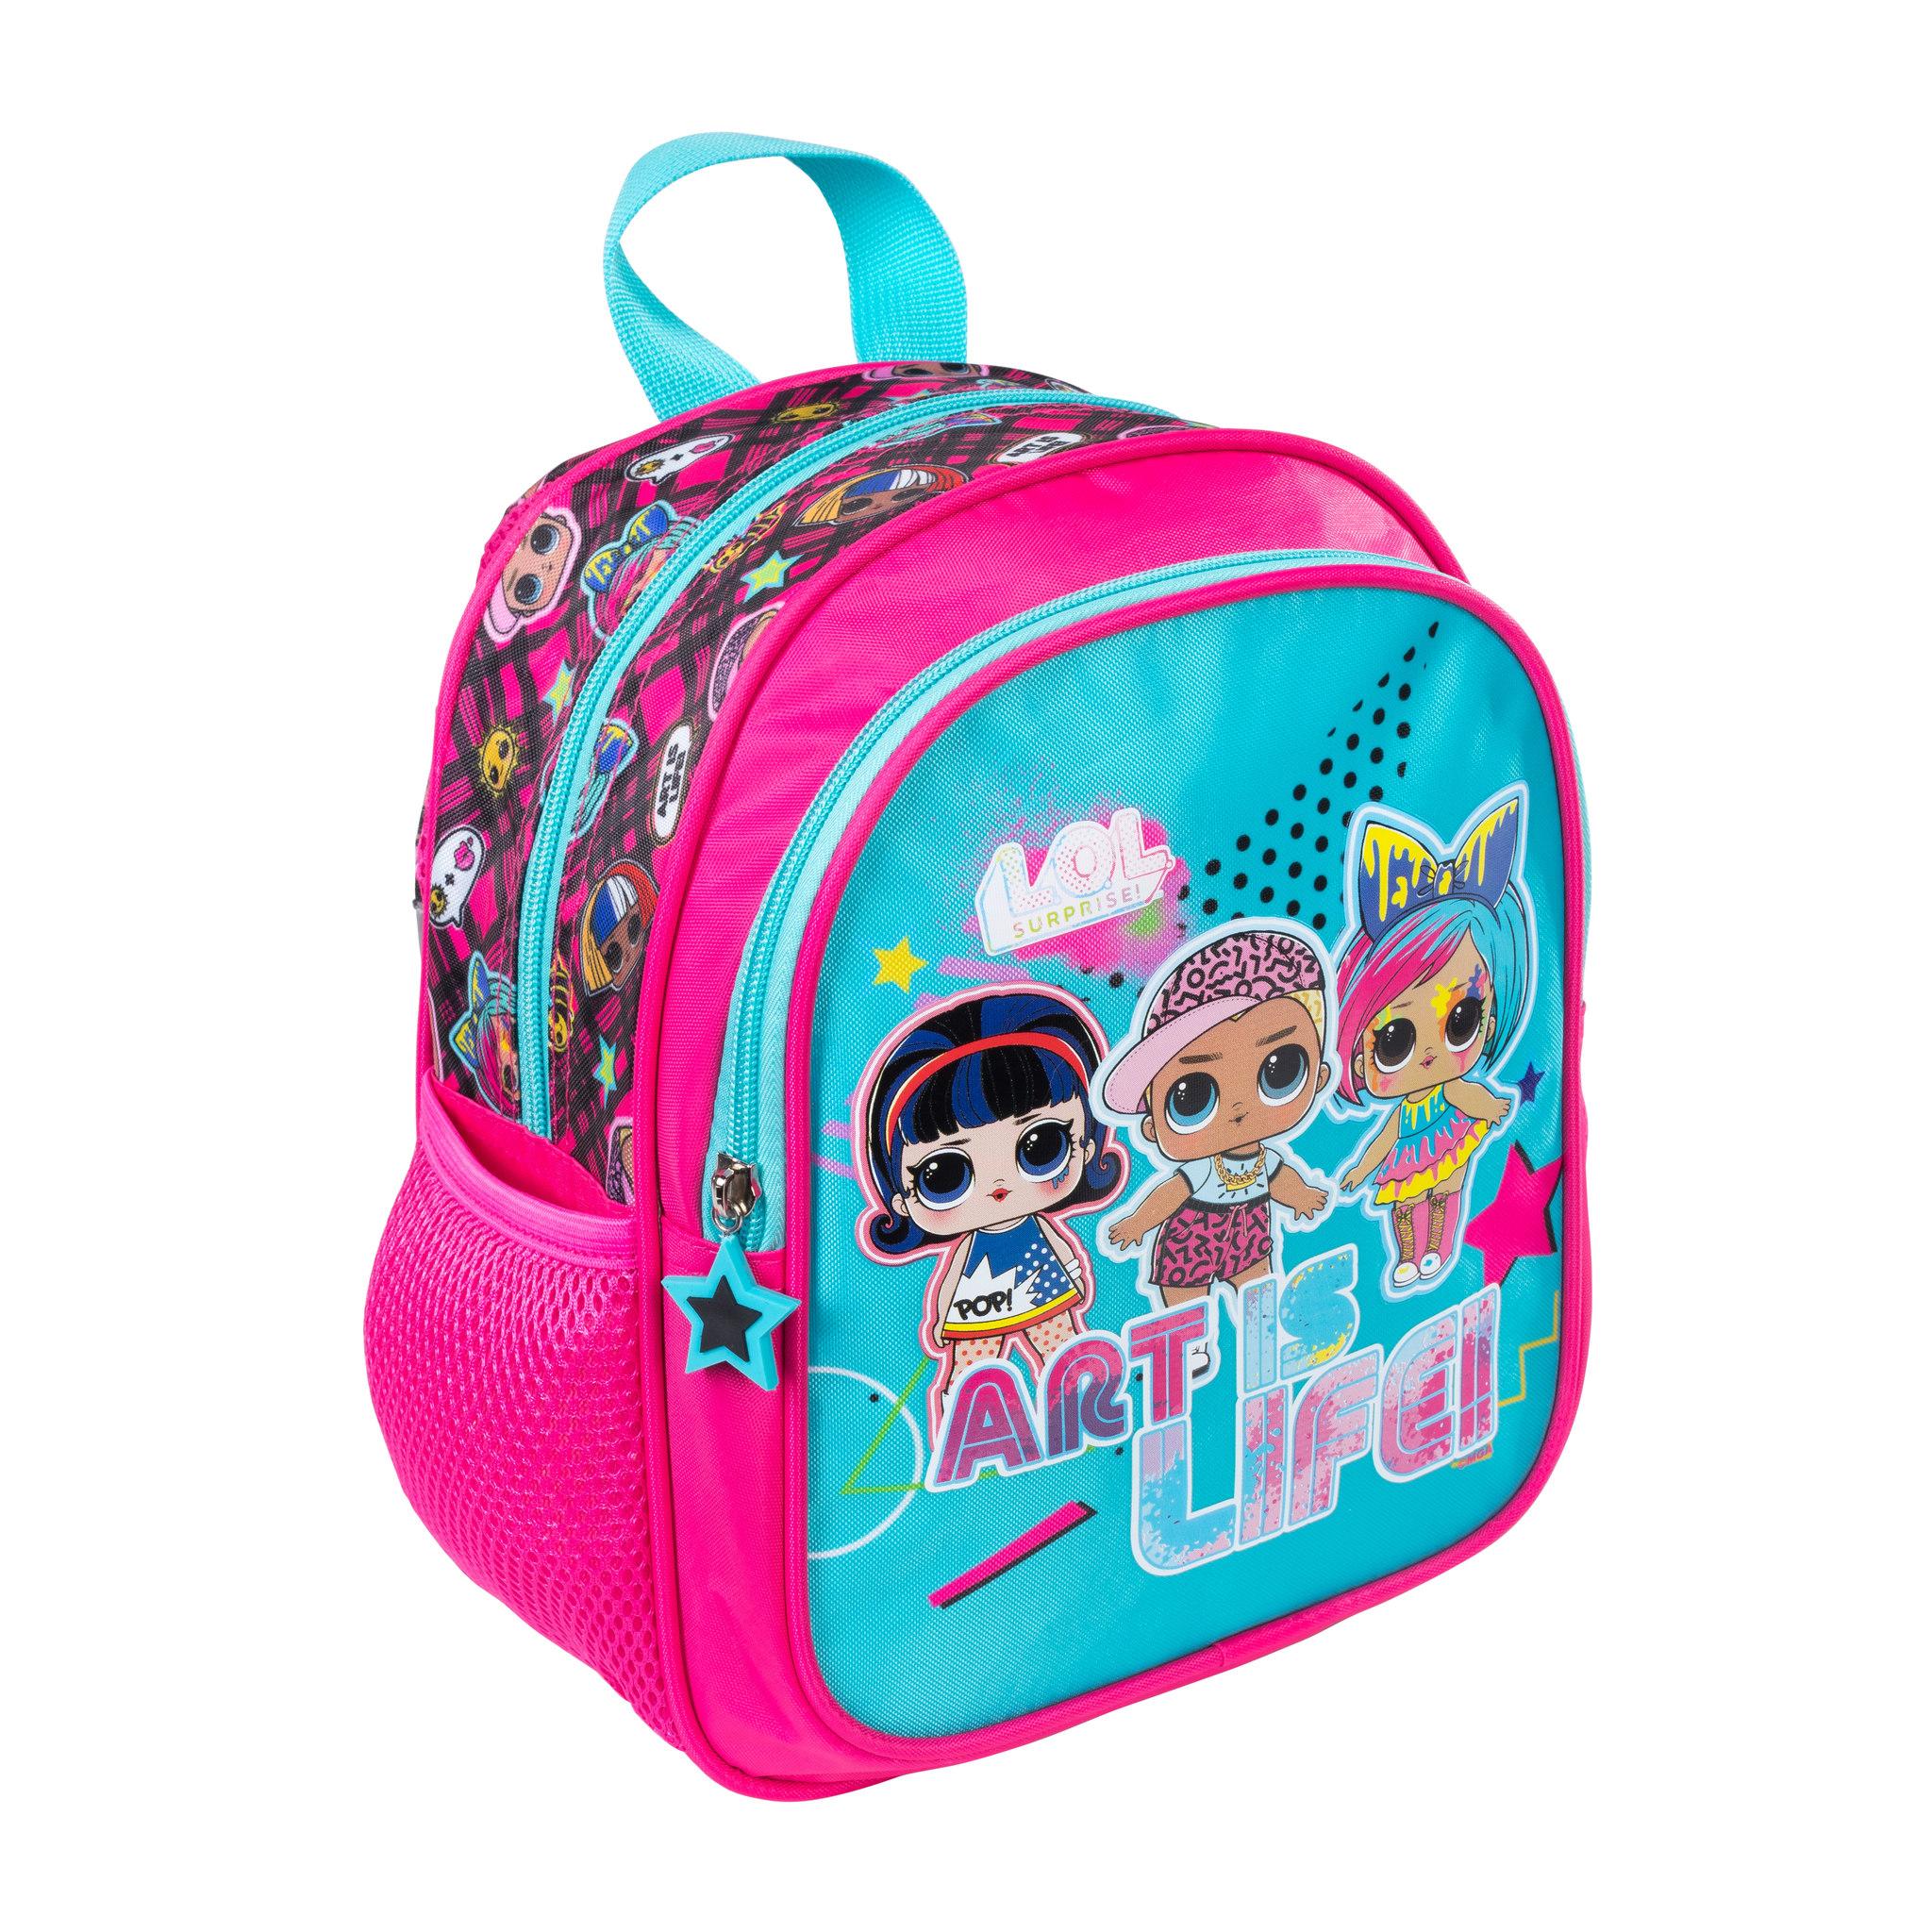 Plecak przedszkolny L.O.L. Surprise!